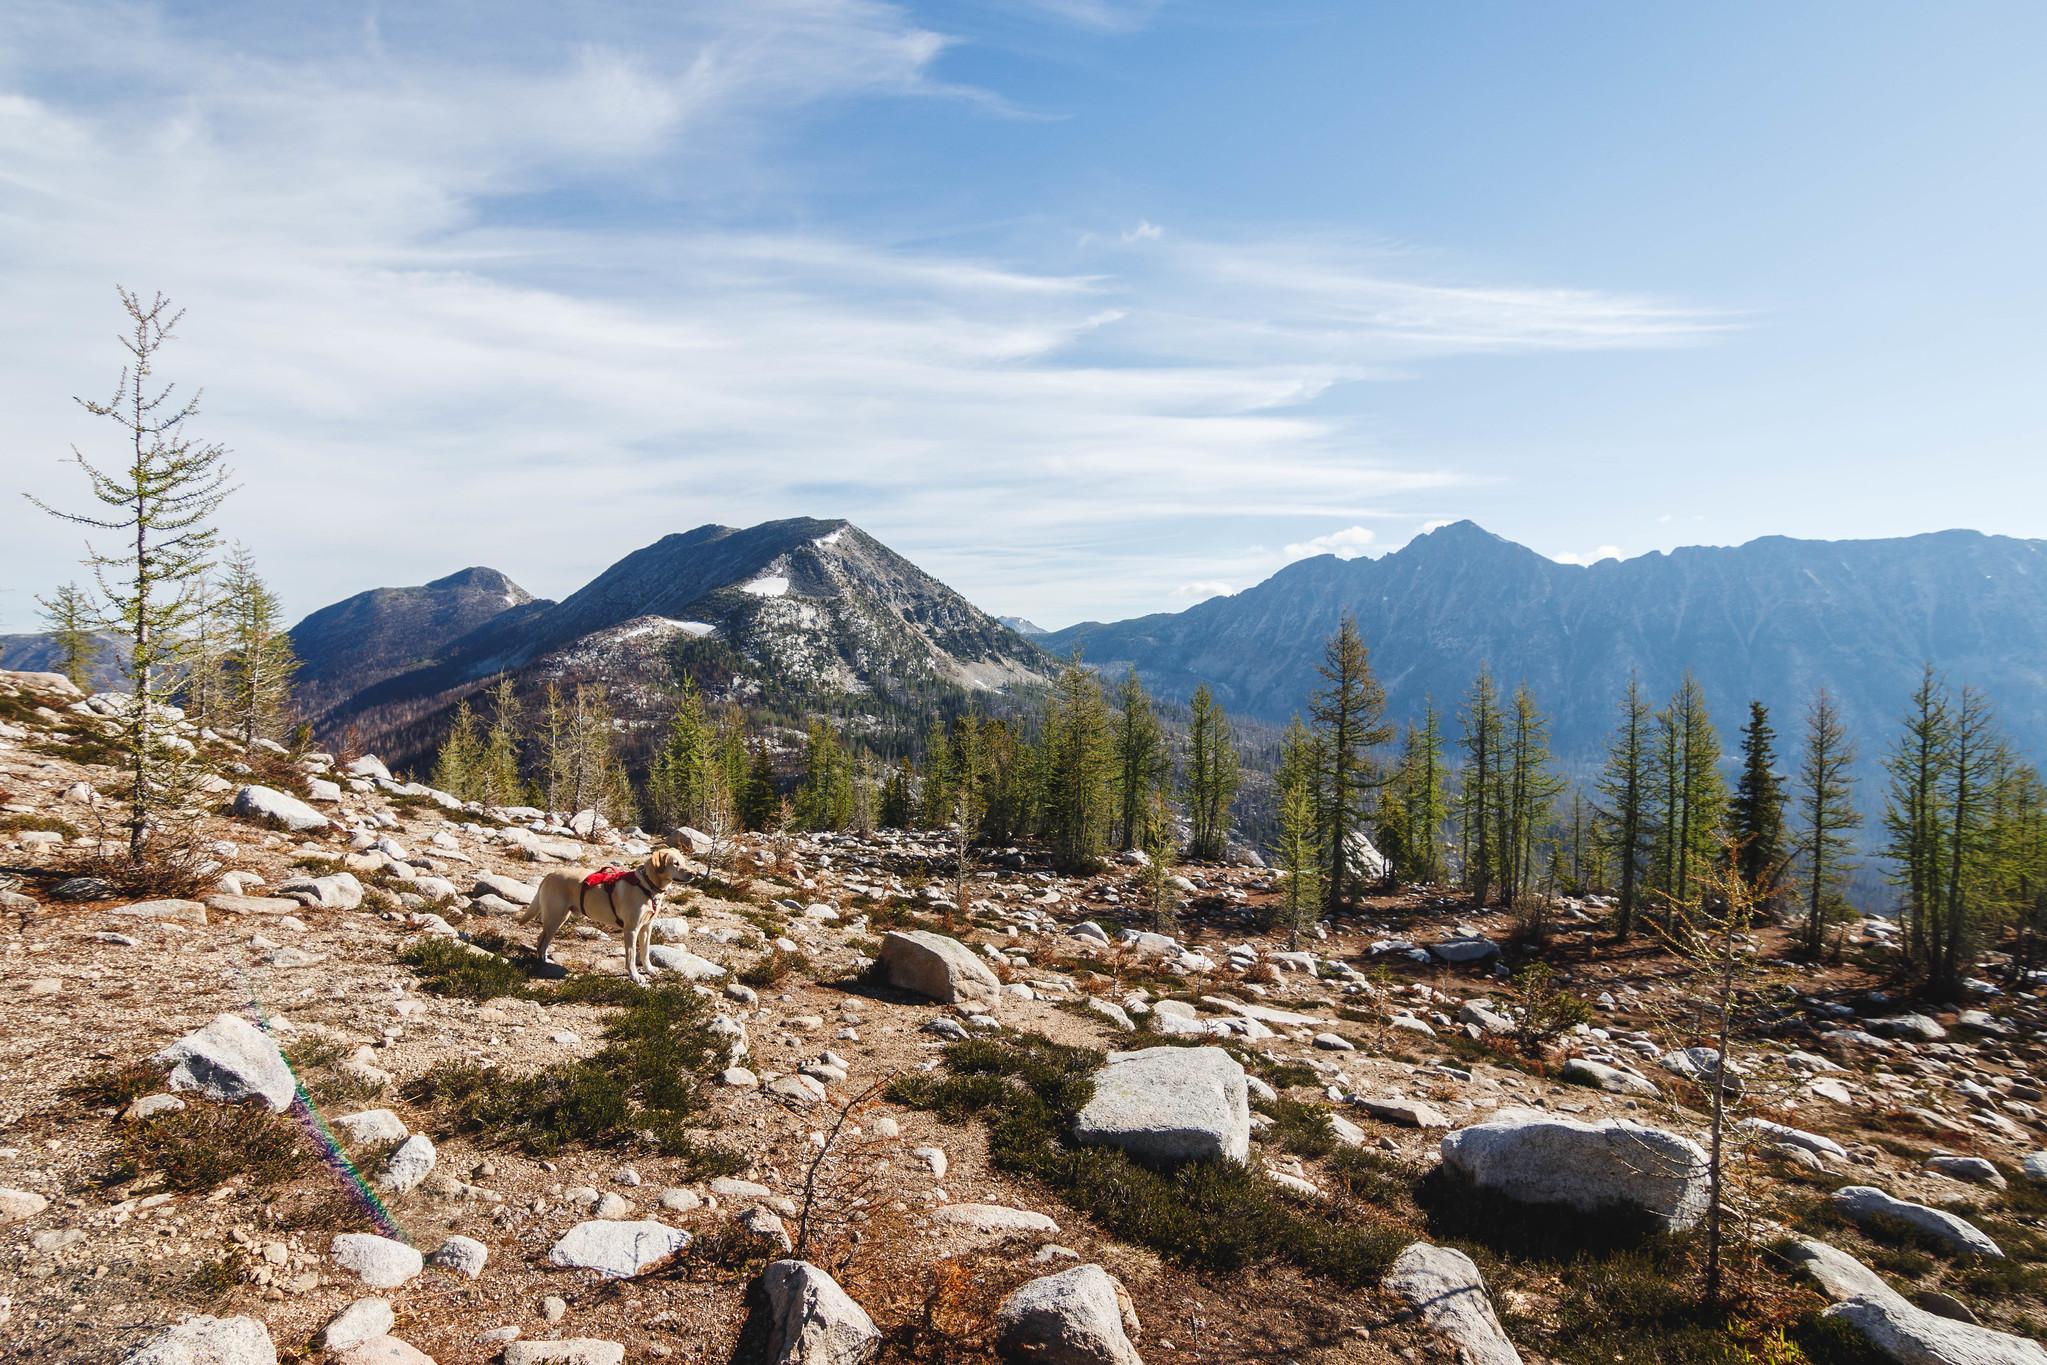 Looking back at Andrew Peak and Amos Peak